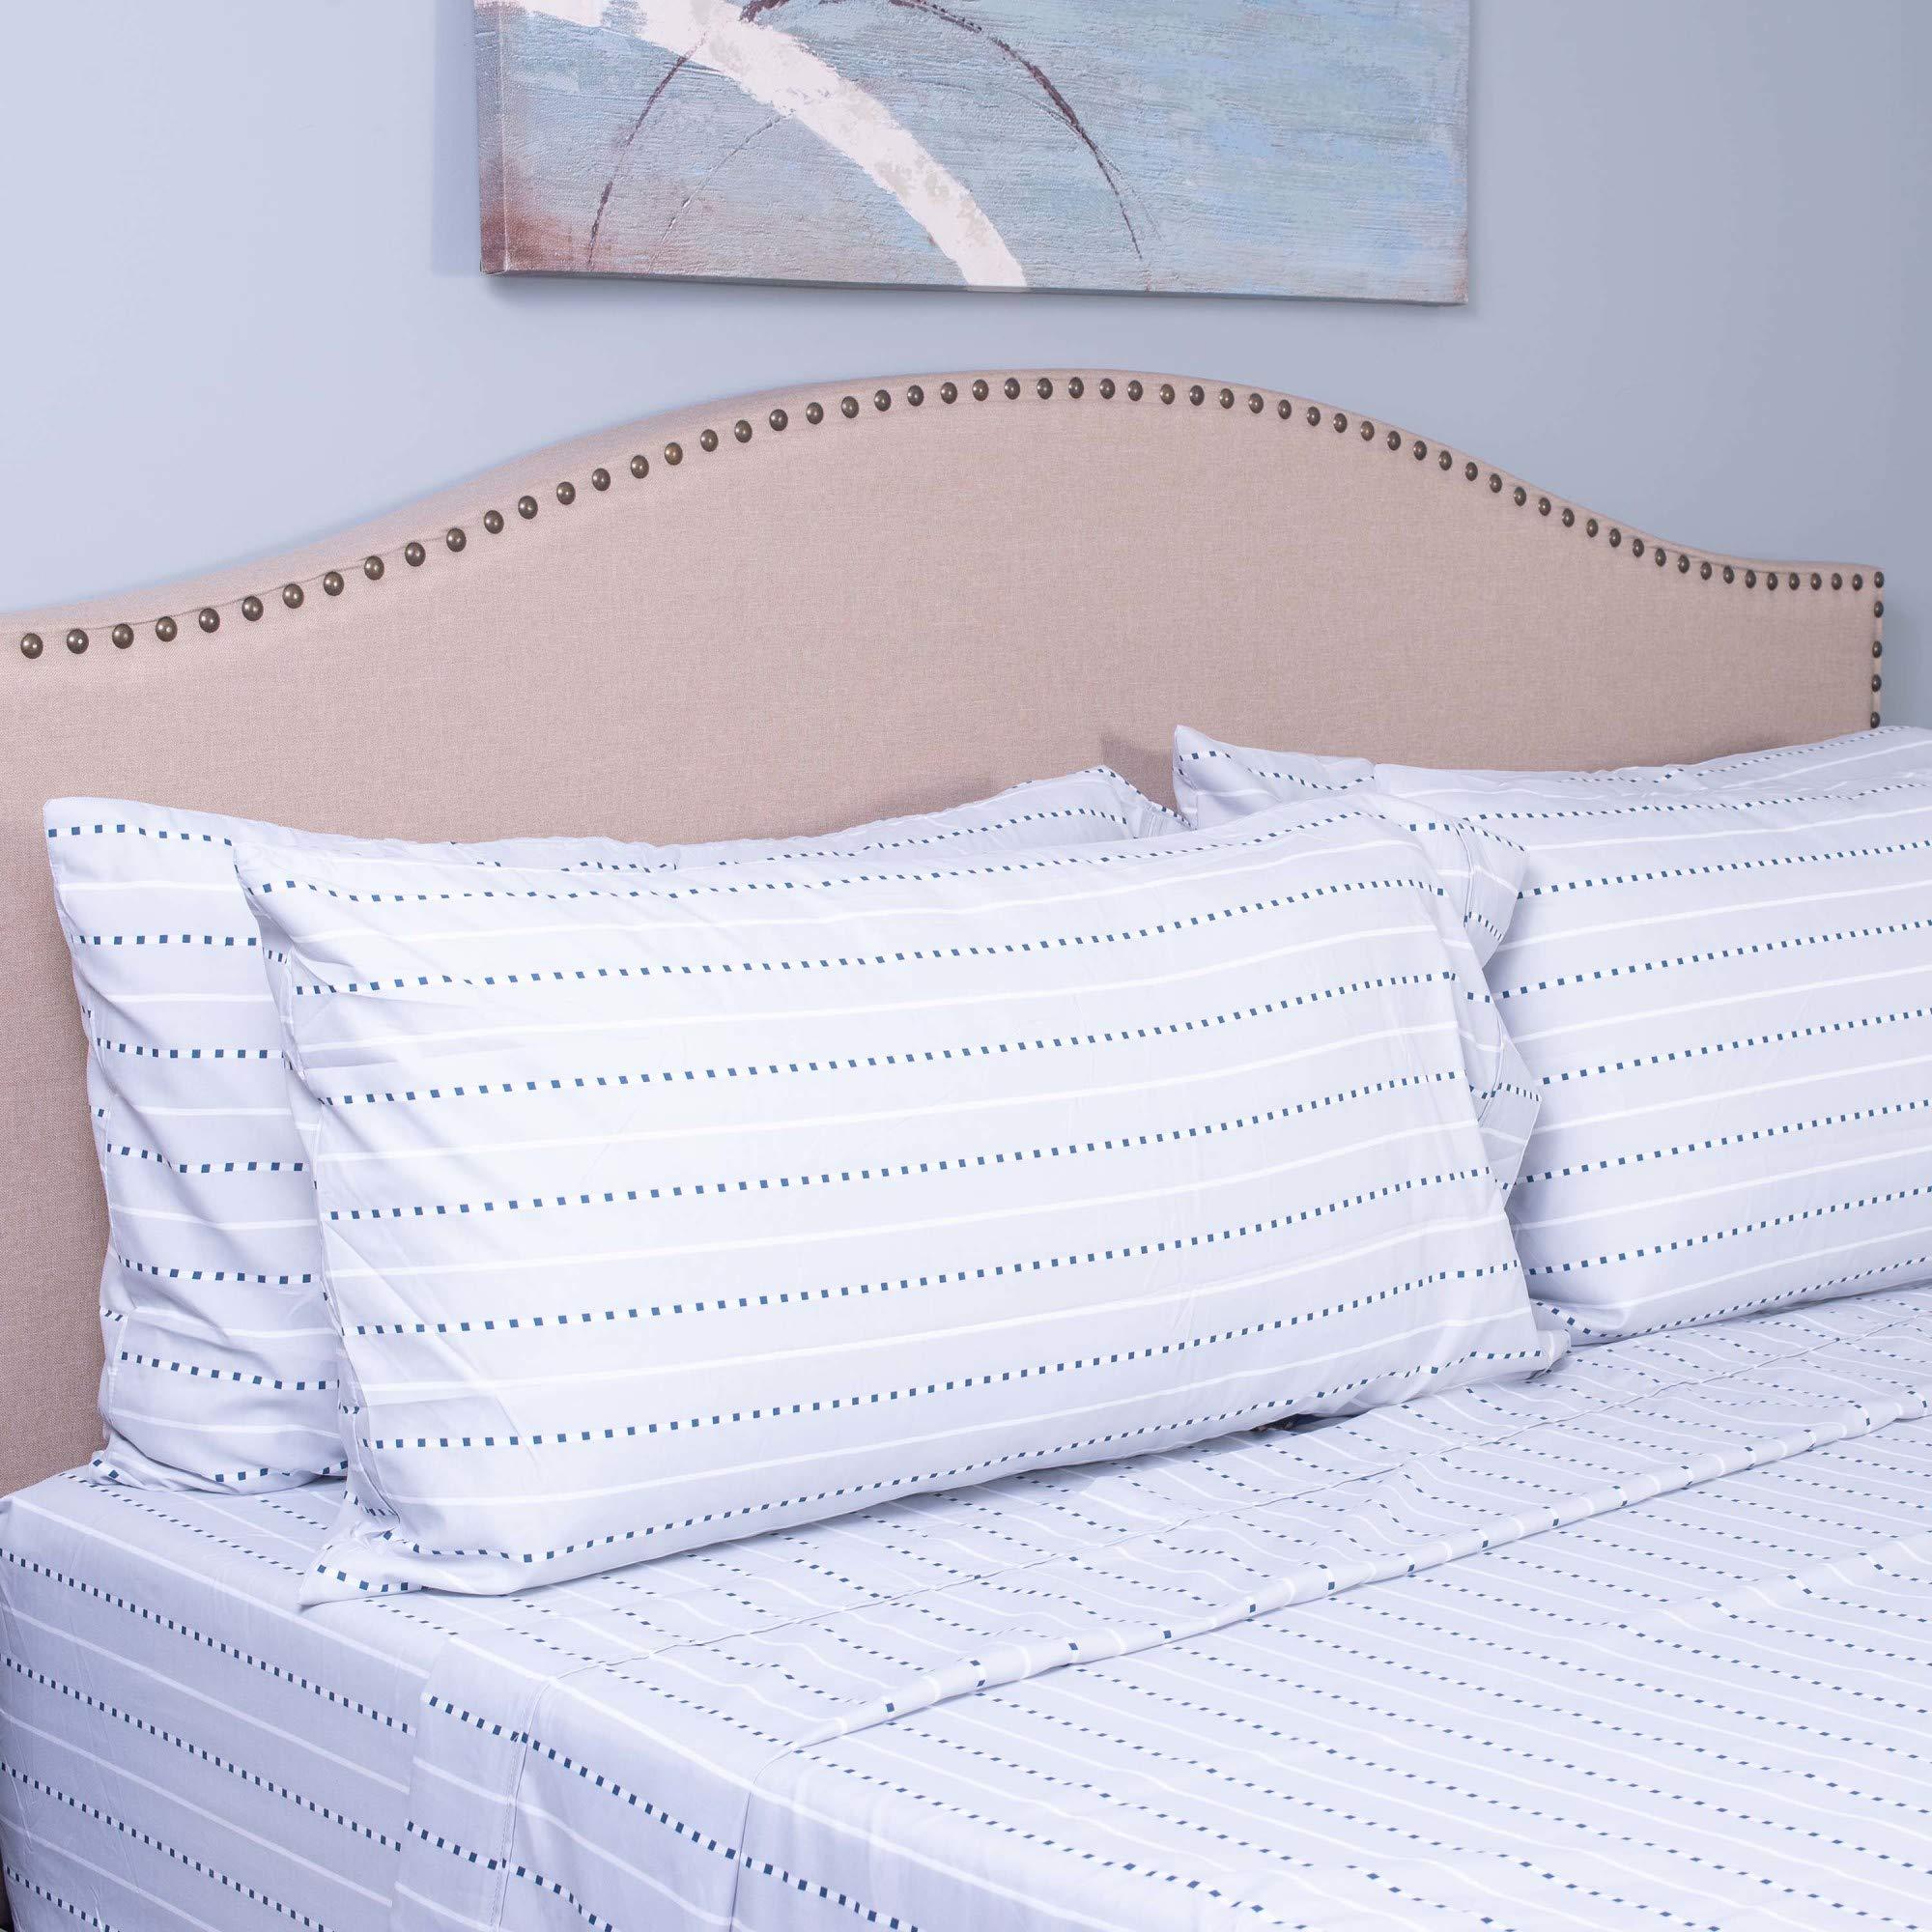 IZOD Sperry Stripe Sheet Set, Queen, Light Grey